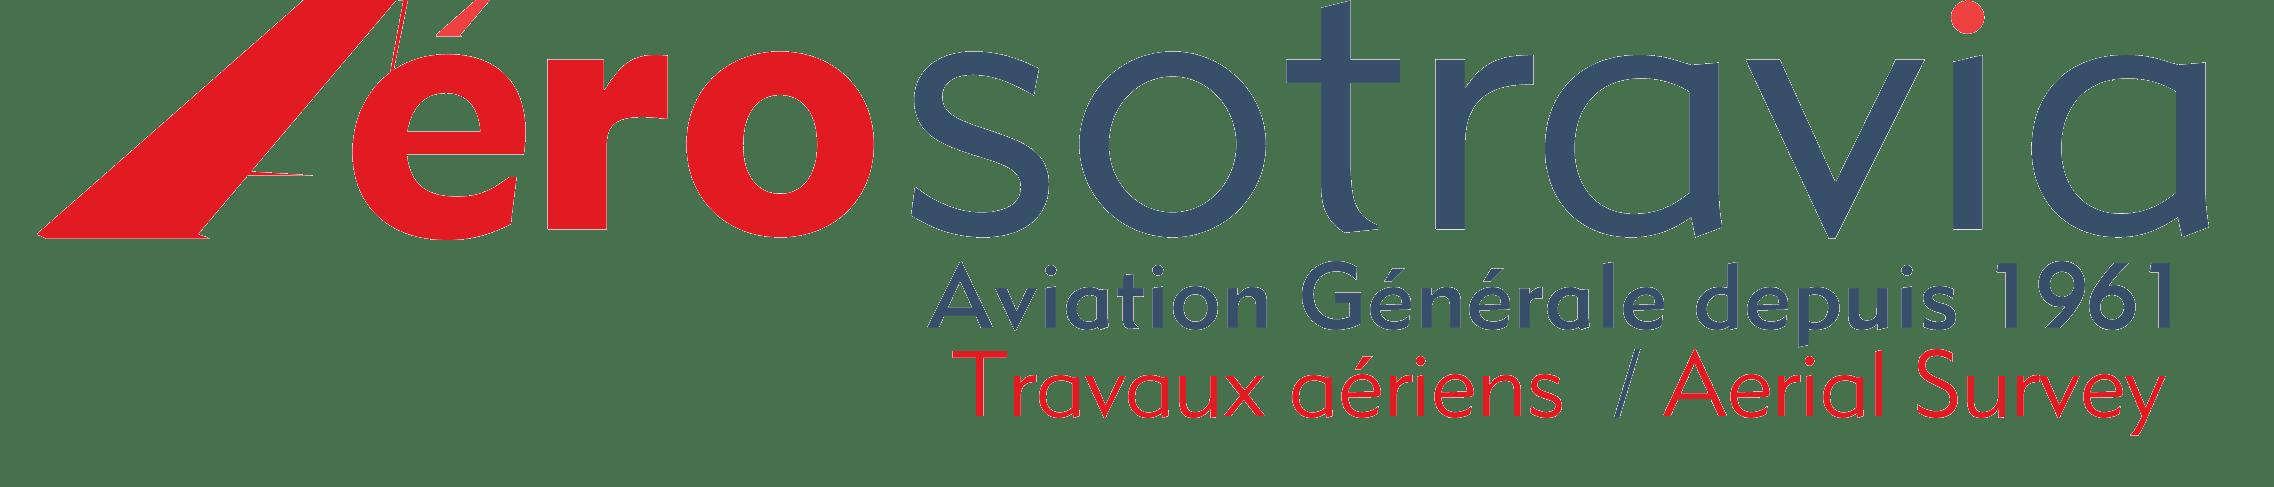 ASI-Group Aerosotravia